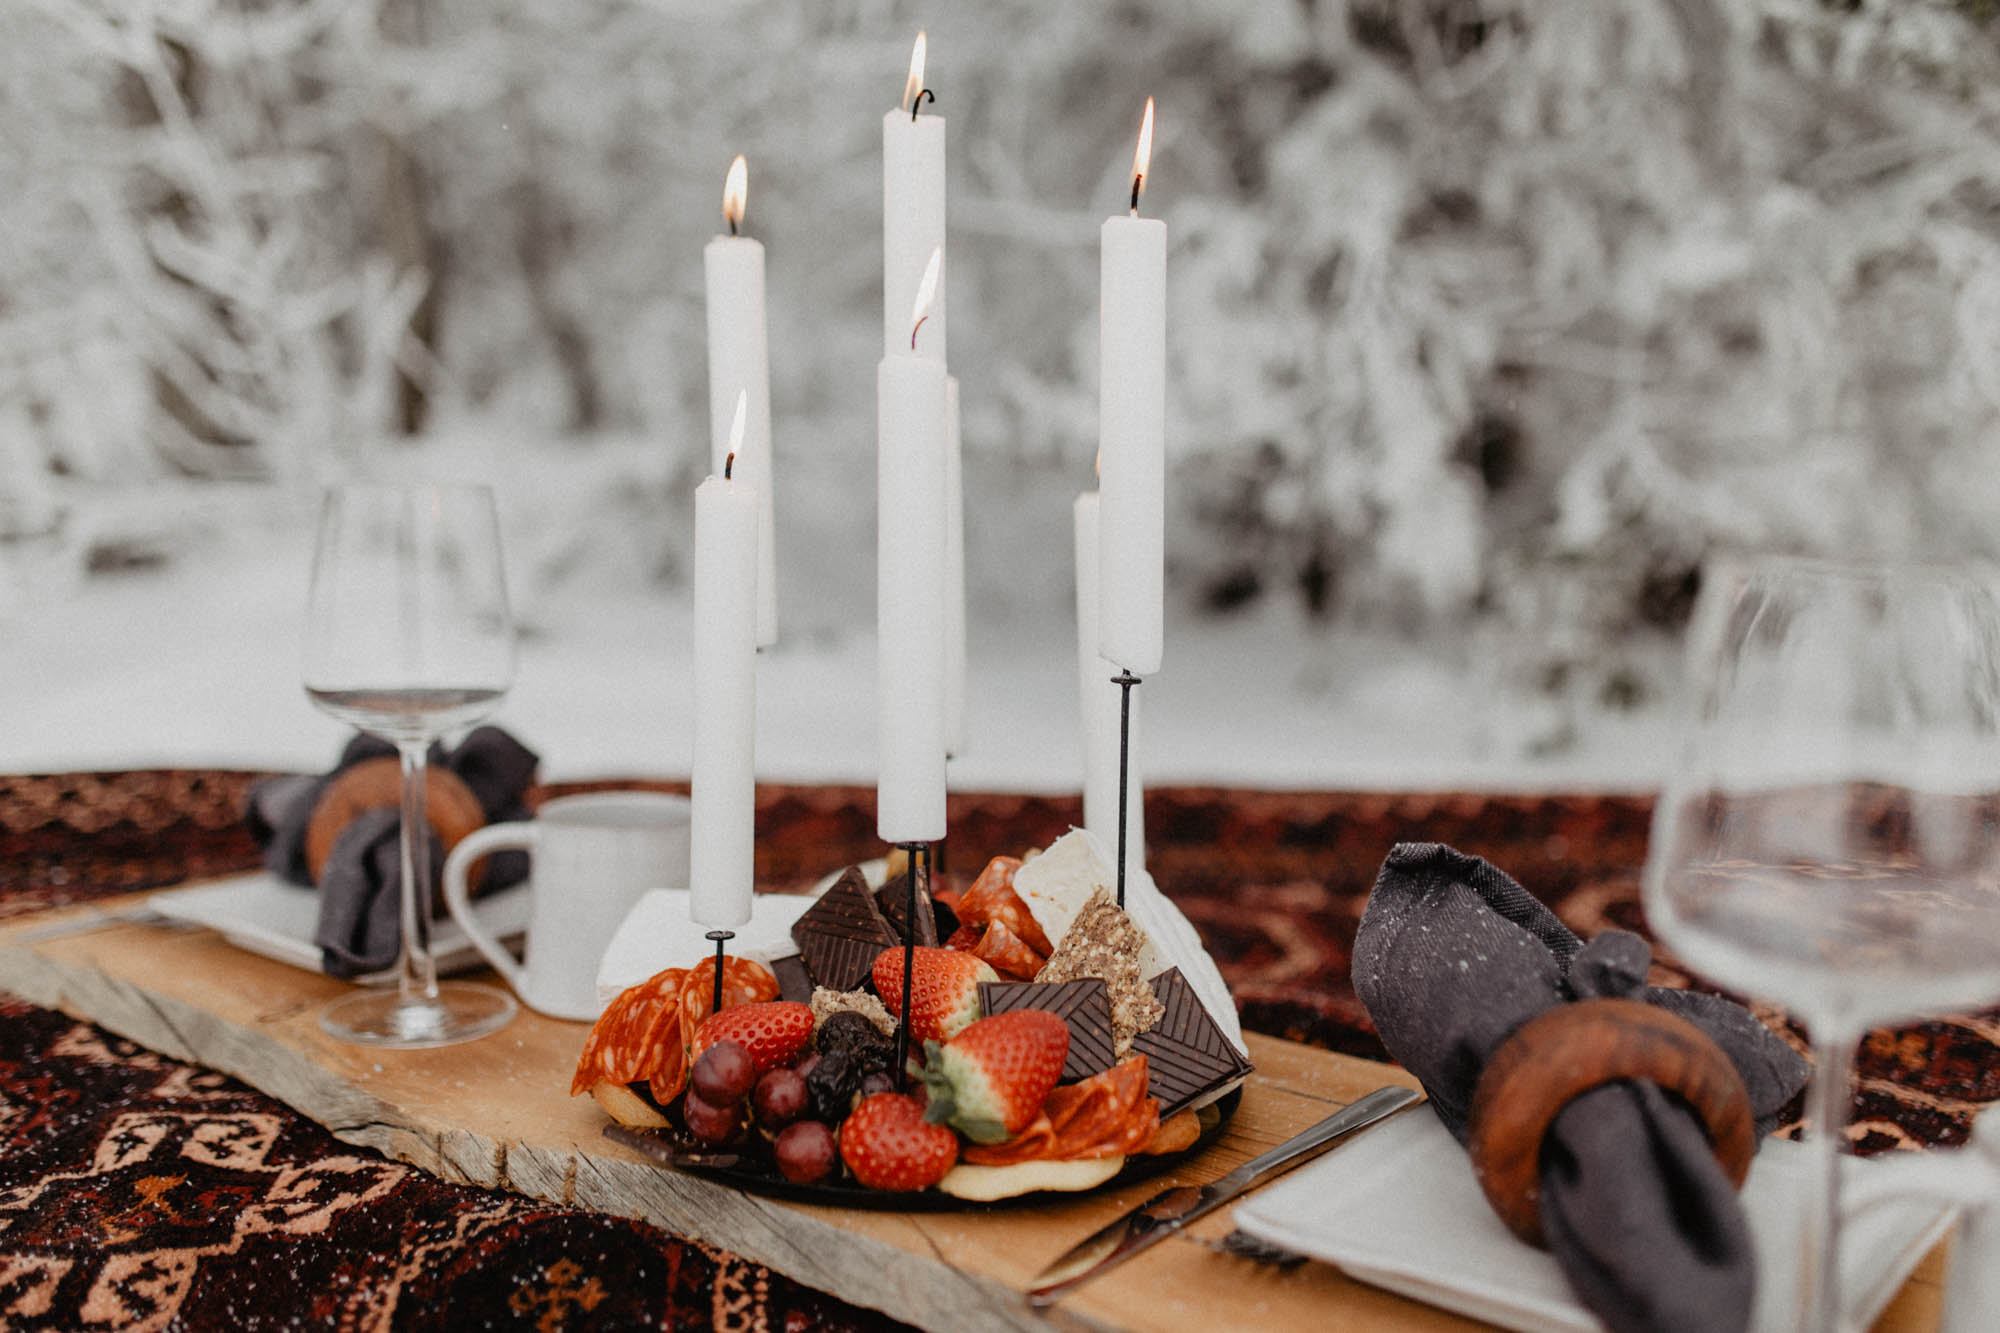 ashley_schulman_photography-winter_wedding_tampere-45.jpg